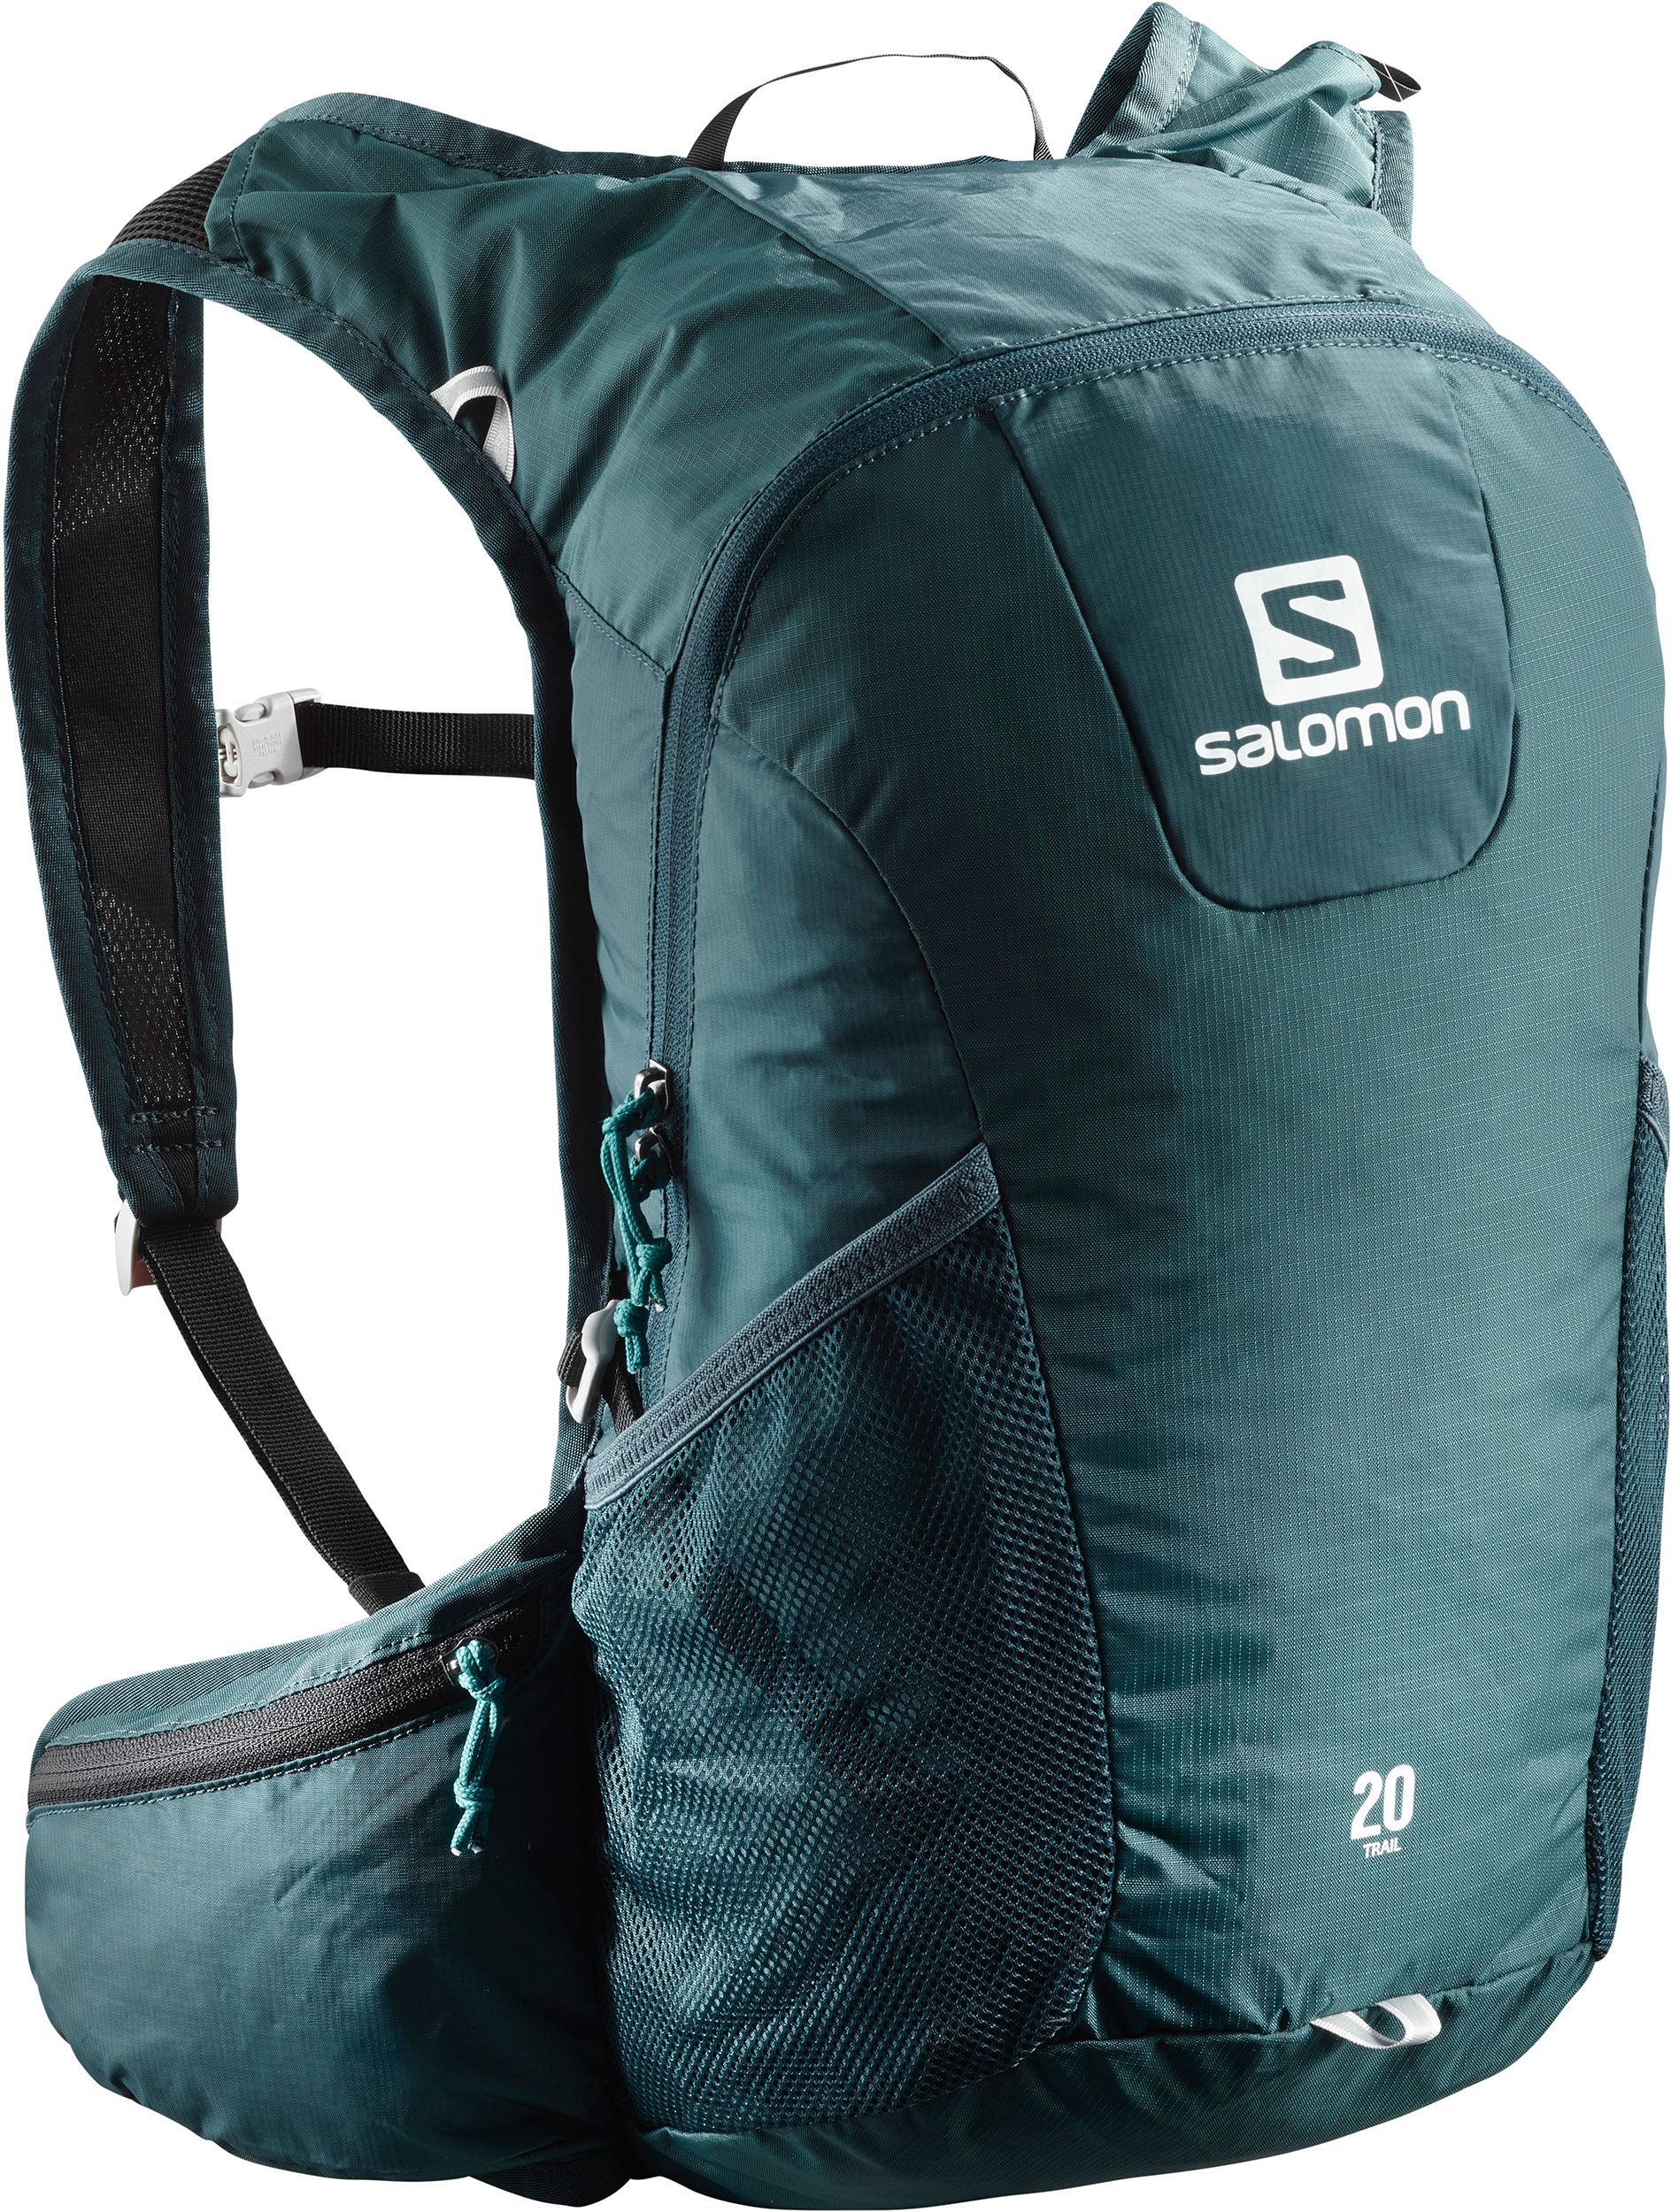 acheter populaire 1b471 b3022 Salomon Trail 20 Pack - Unisex